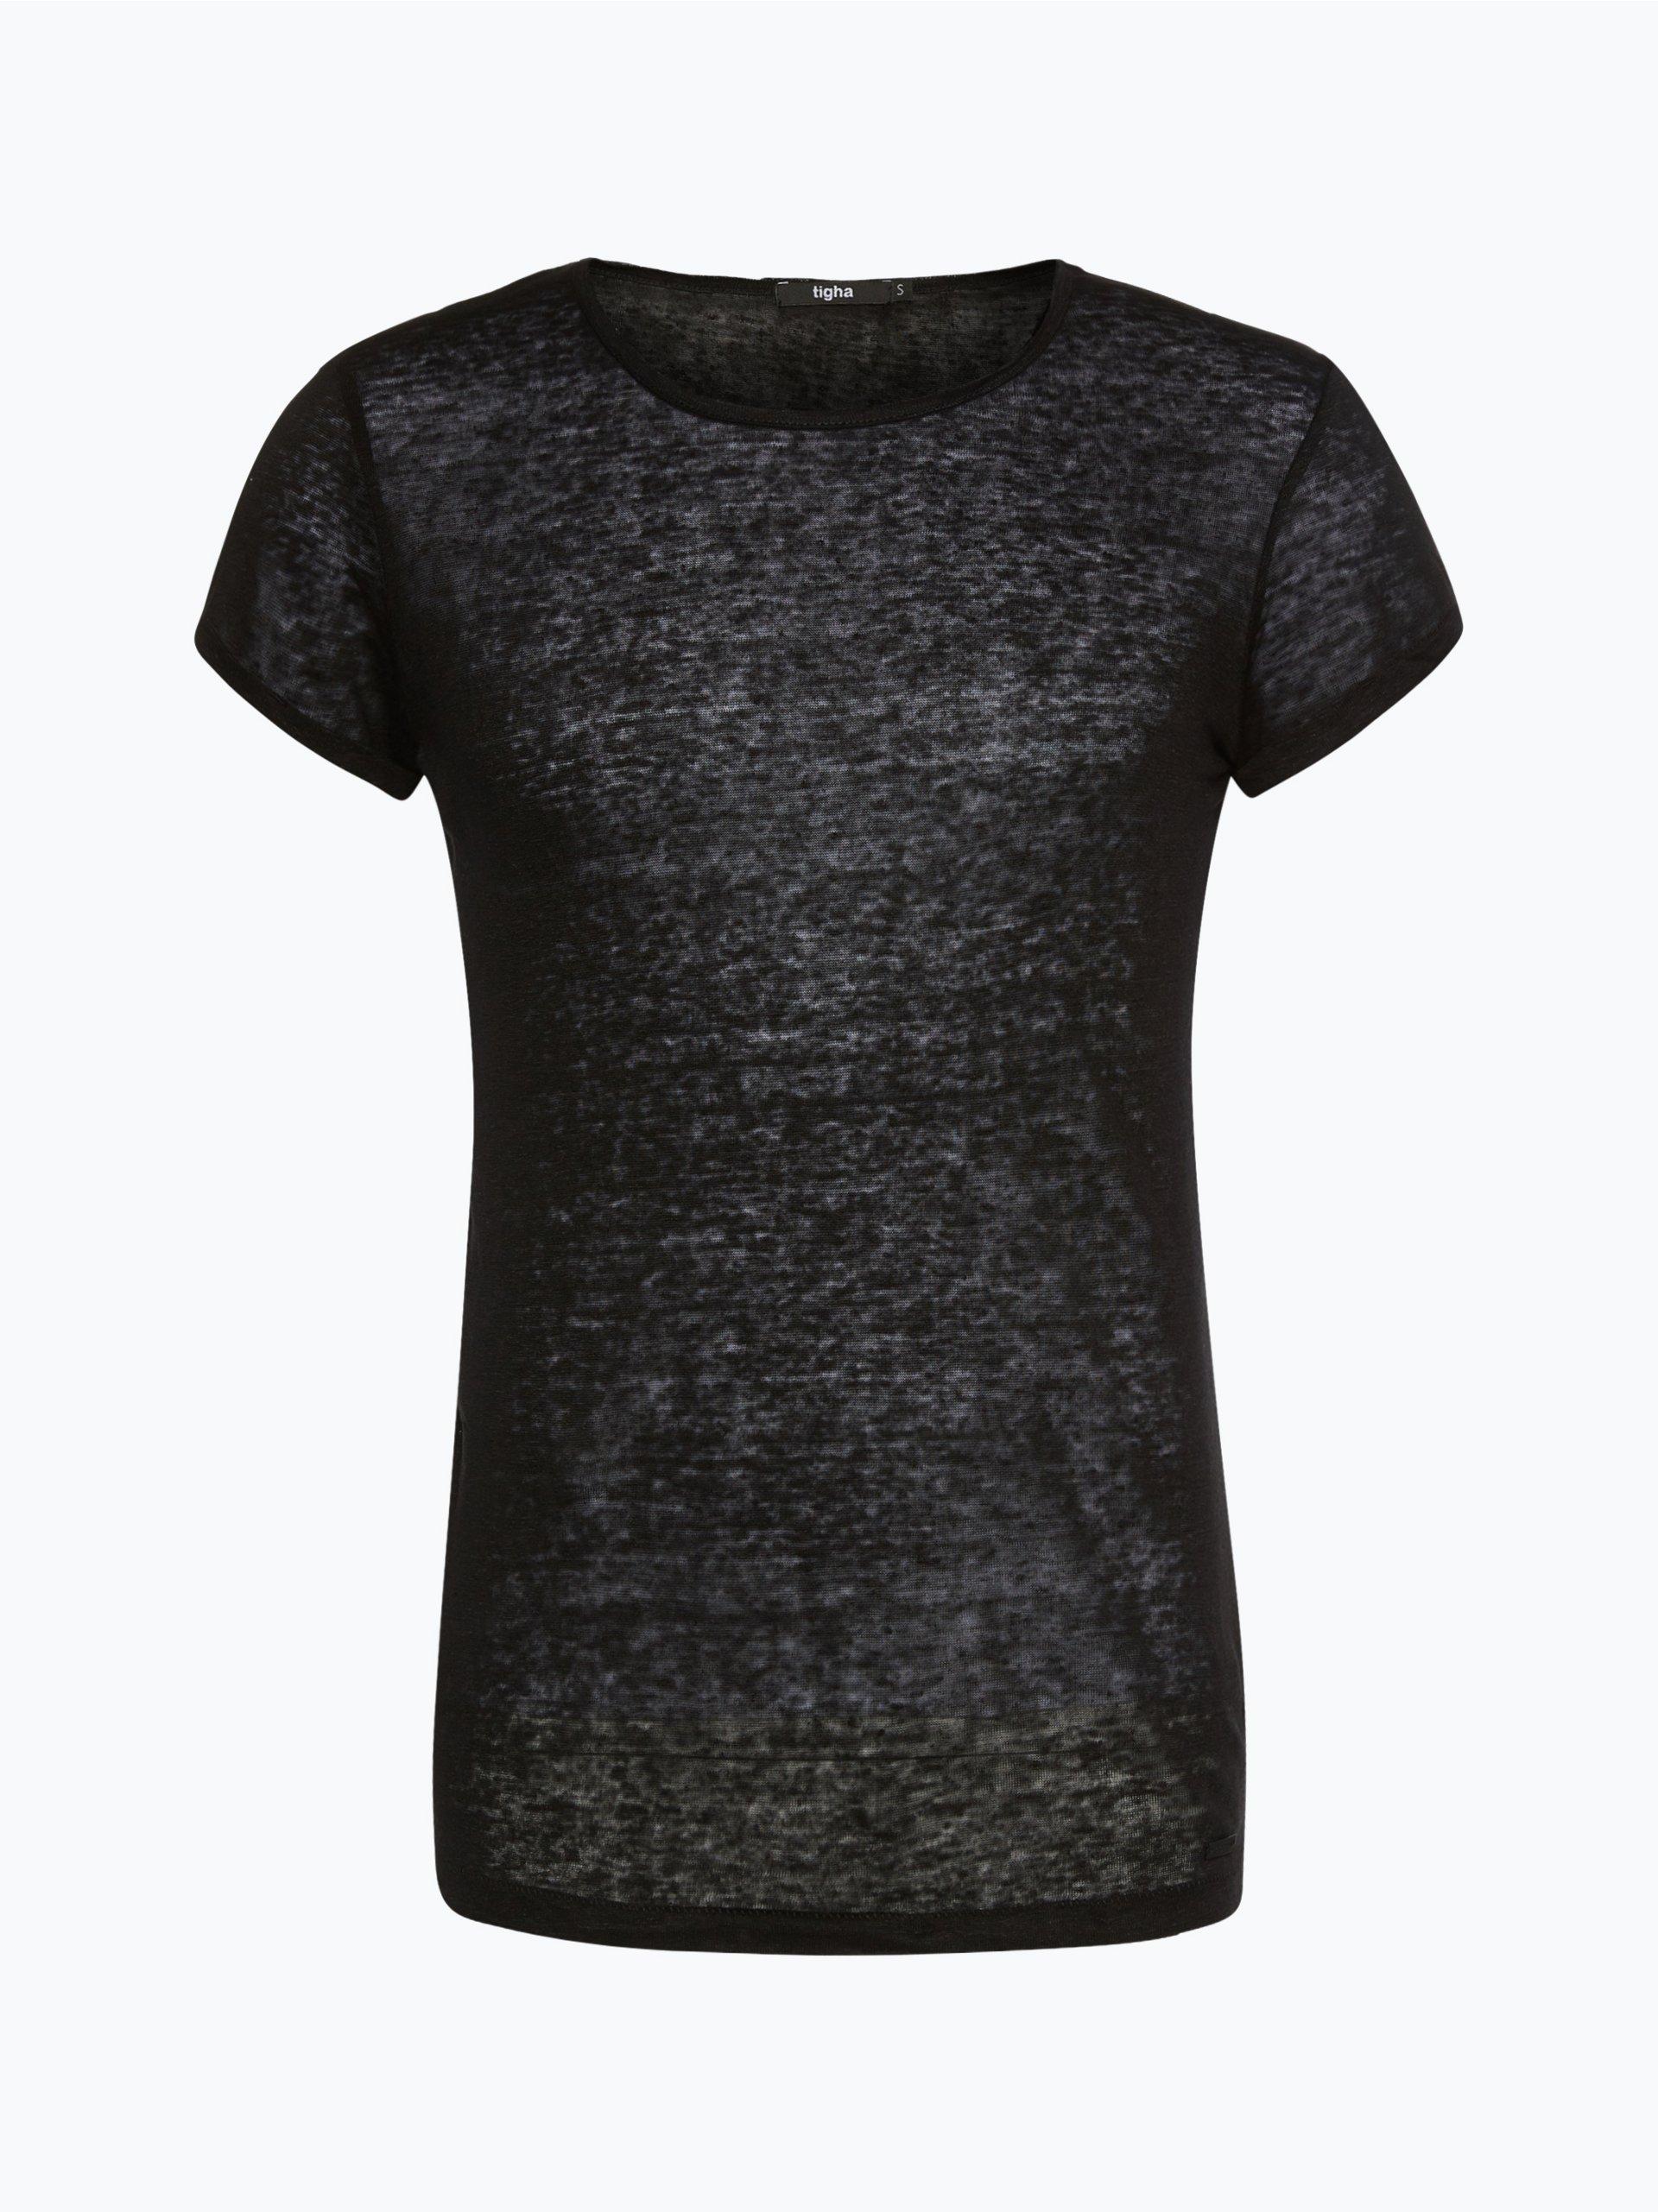 tigha herren leinenshirt rojan schwarz uni online kaufen vangraaf com. Black Bedroom Furniture Sets. Home Design Ideas